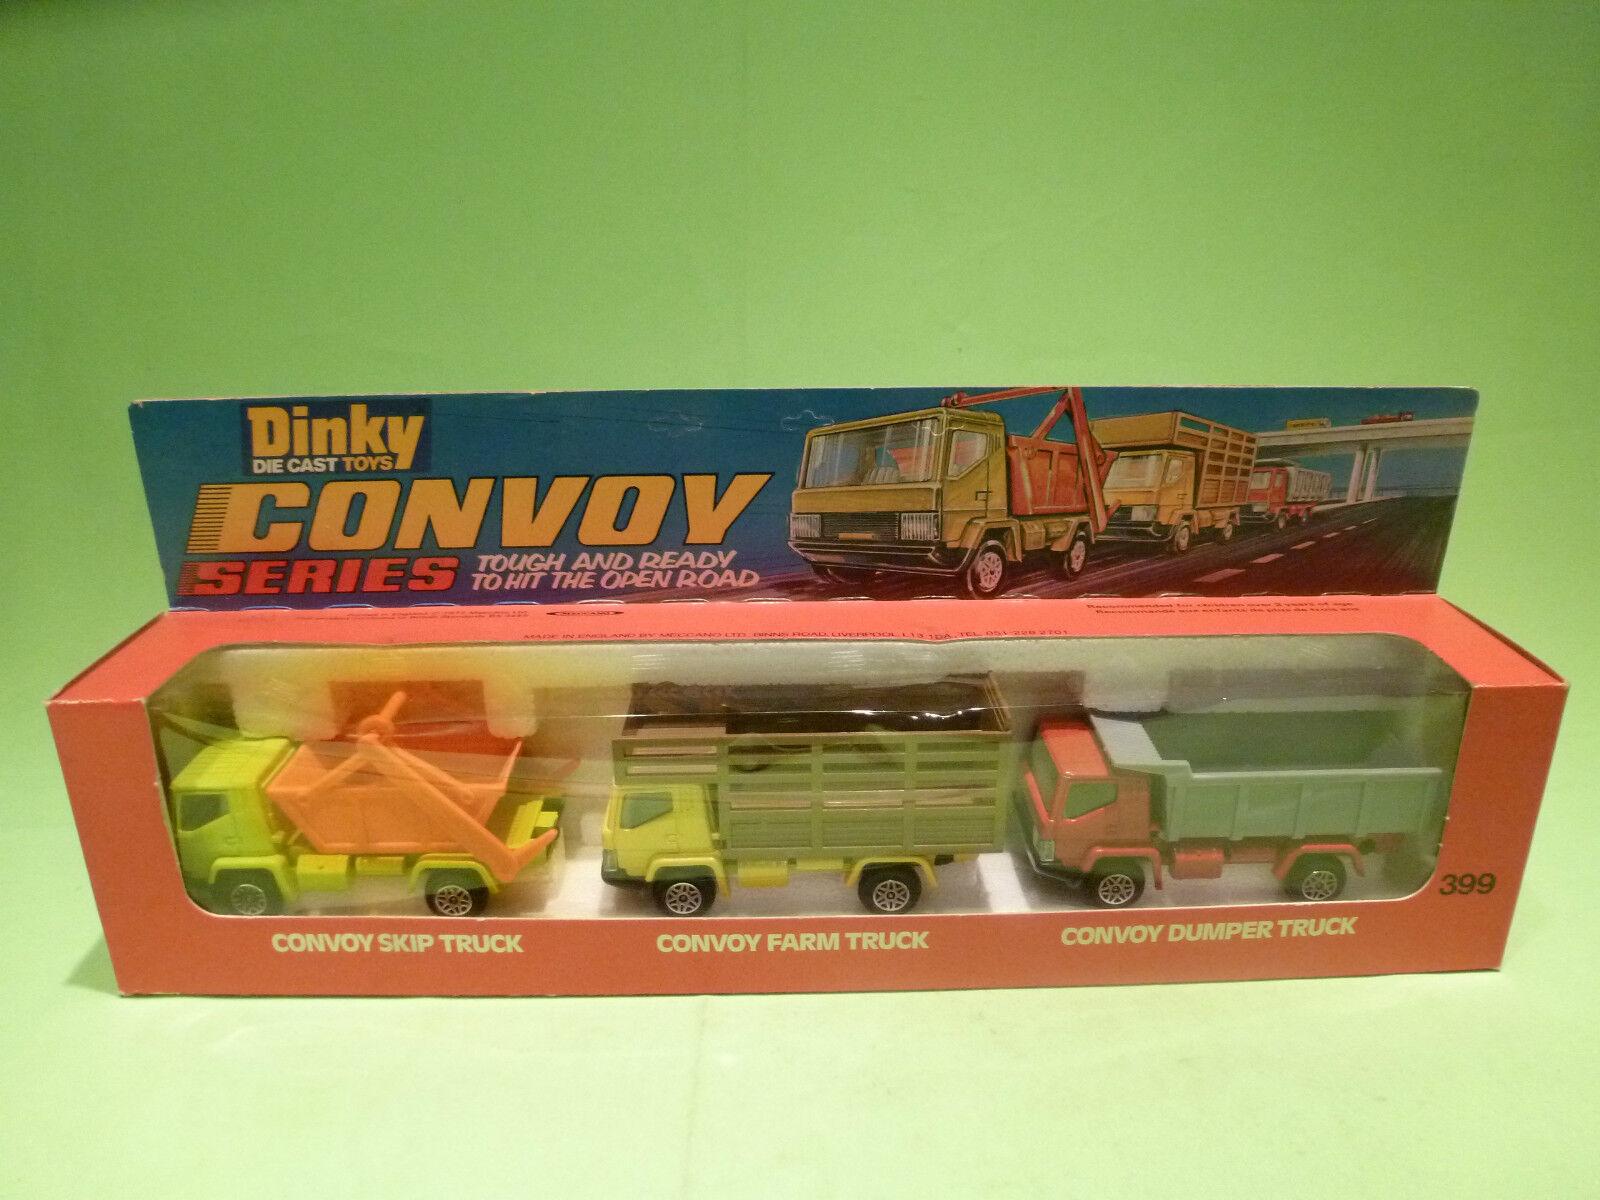 DINKY TOYS 399 CONVOY SKIP + FARM + DUMPER TRUCK - RARE SELTEN - GOOD IN BOX